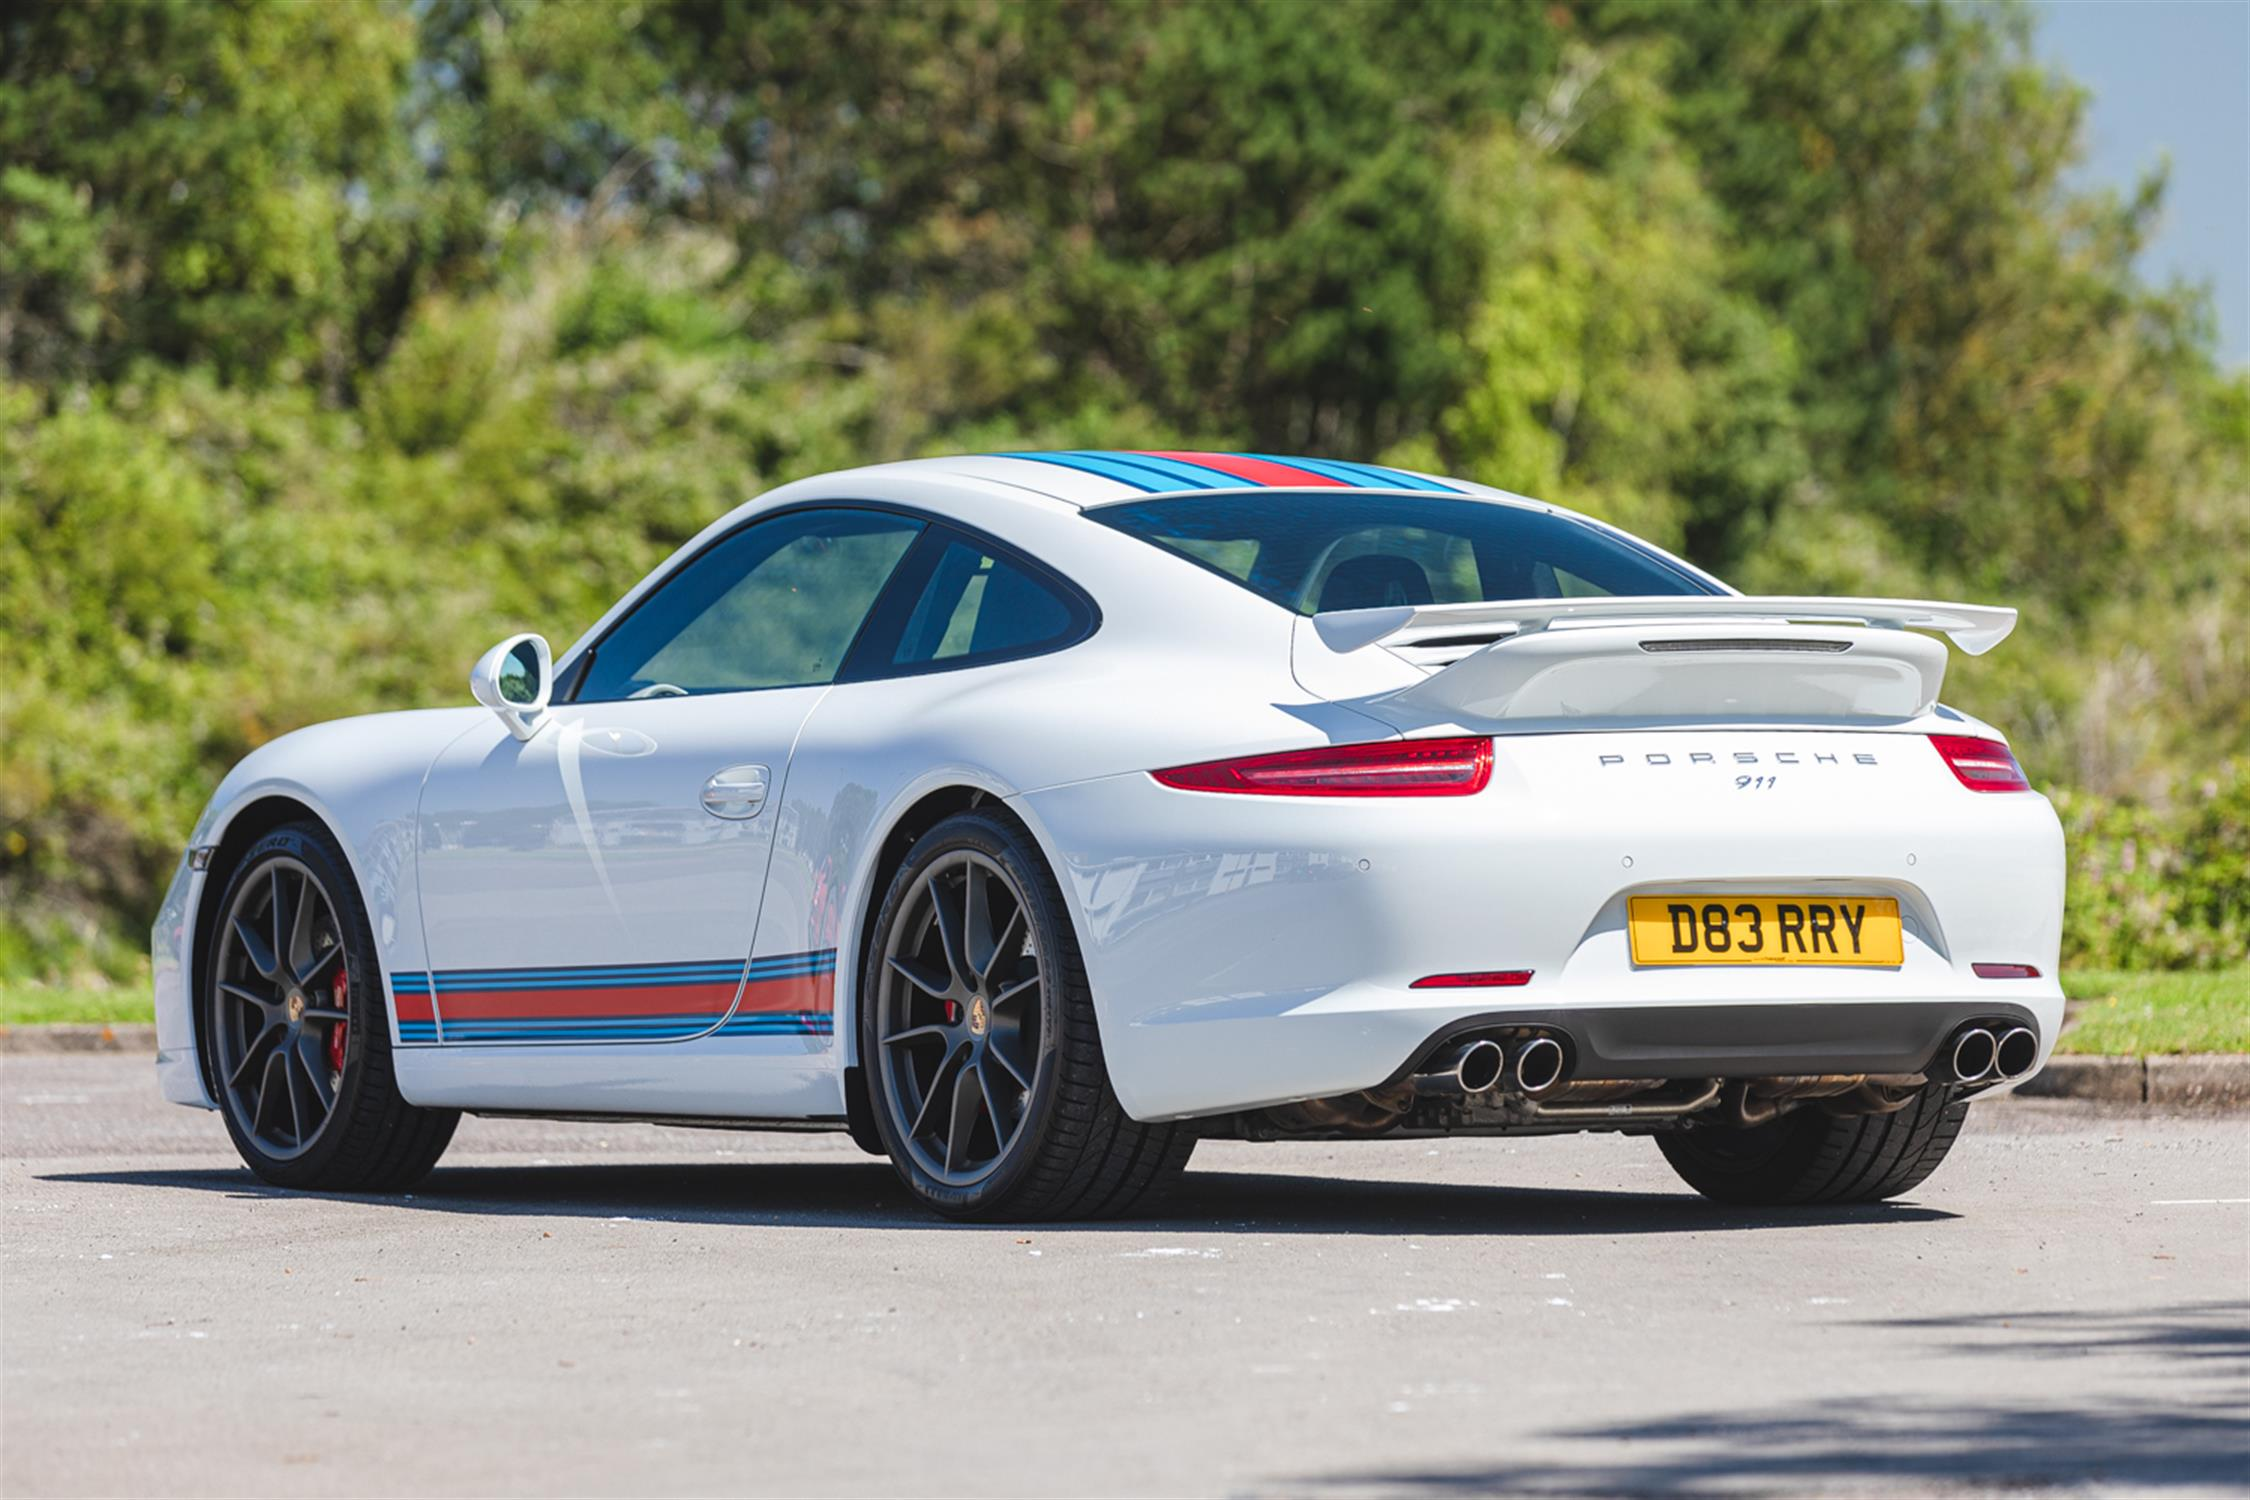 2014 Porsche 911 (991) 3.8 Martini Racing Edition (RHD) - Image 3 of 10